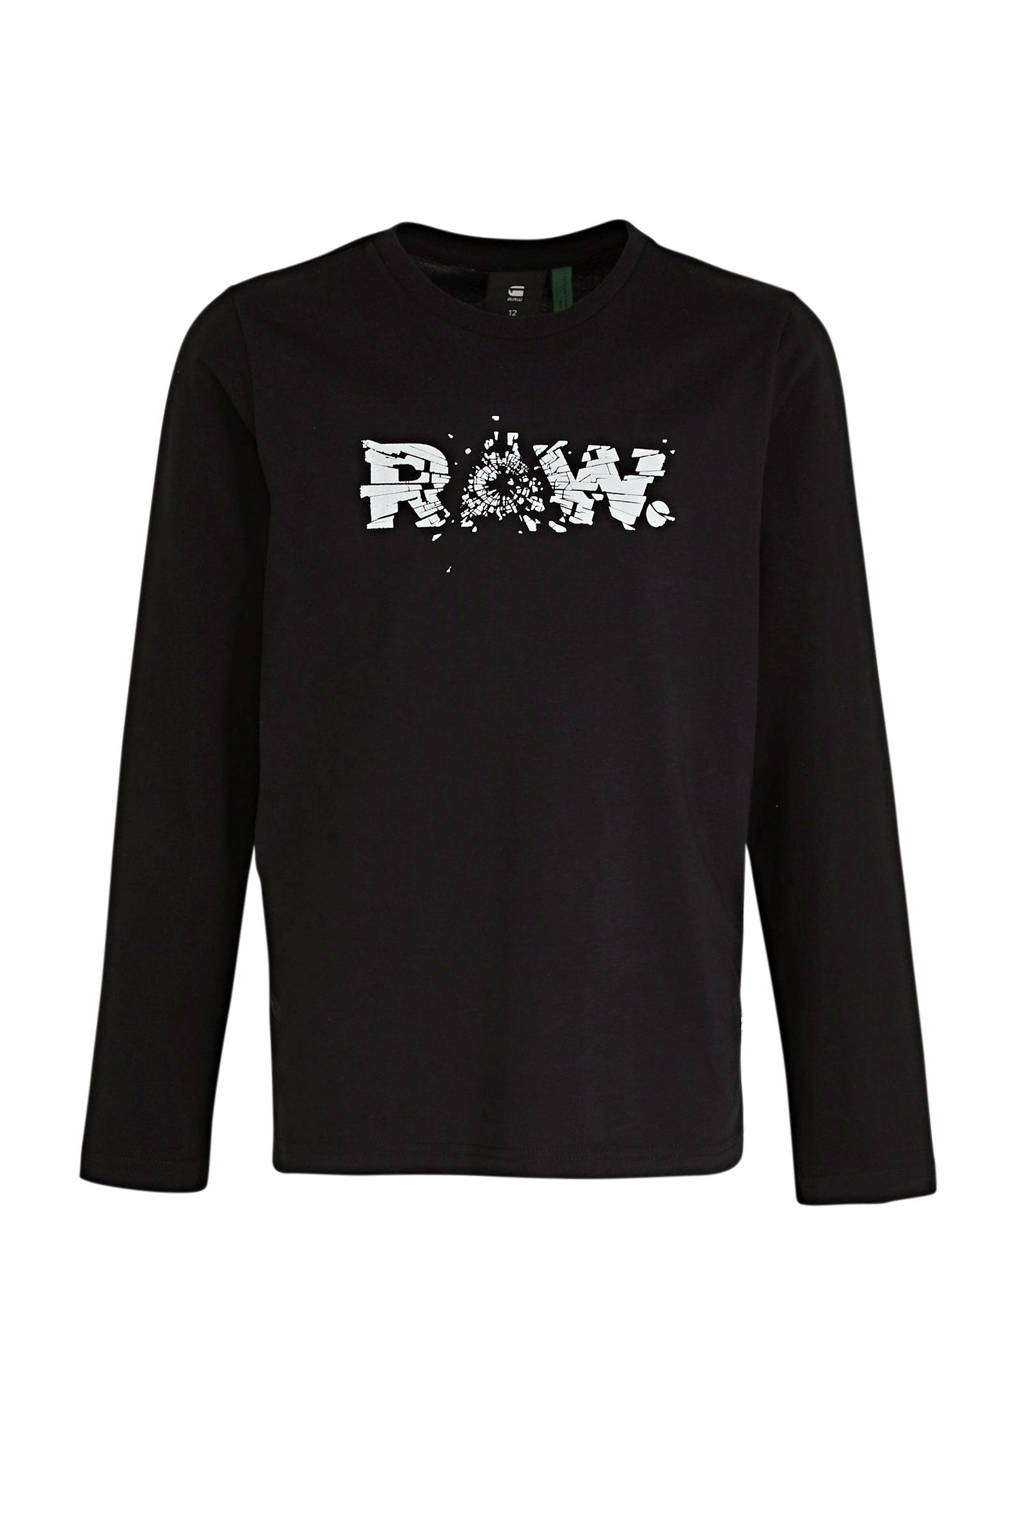 G-Star RAW longsleeve met logo zwart, Zwart